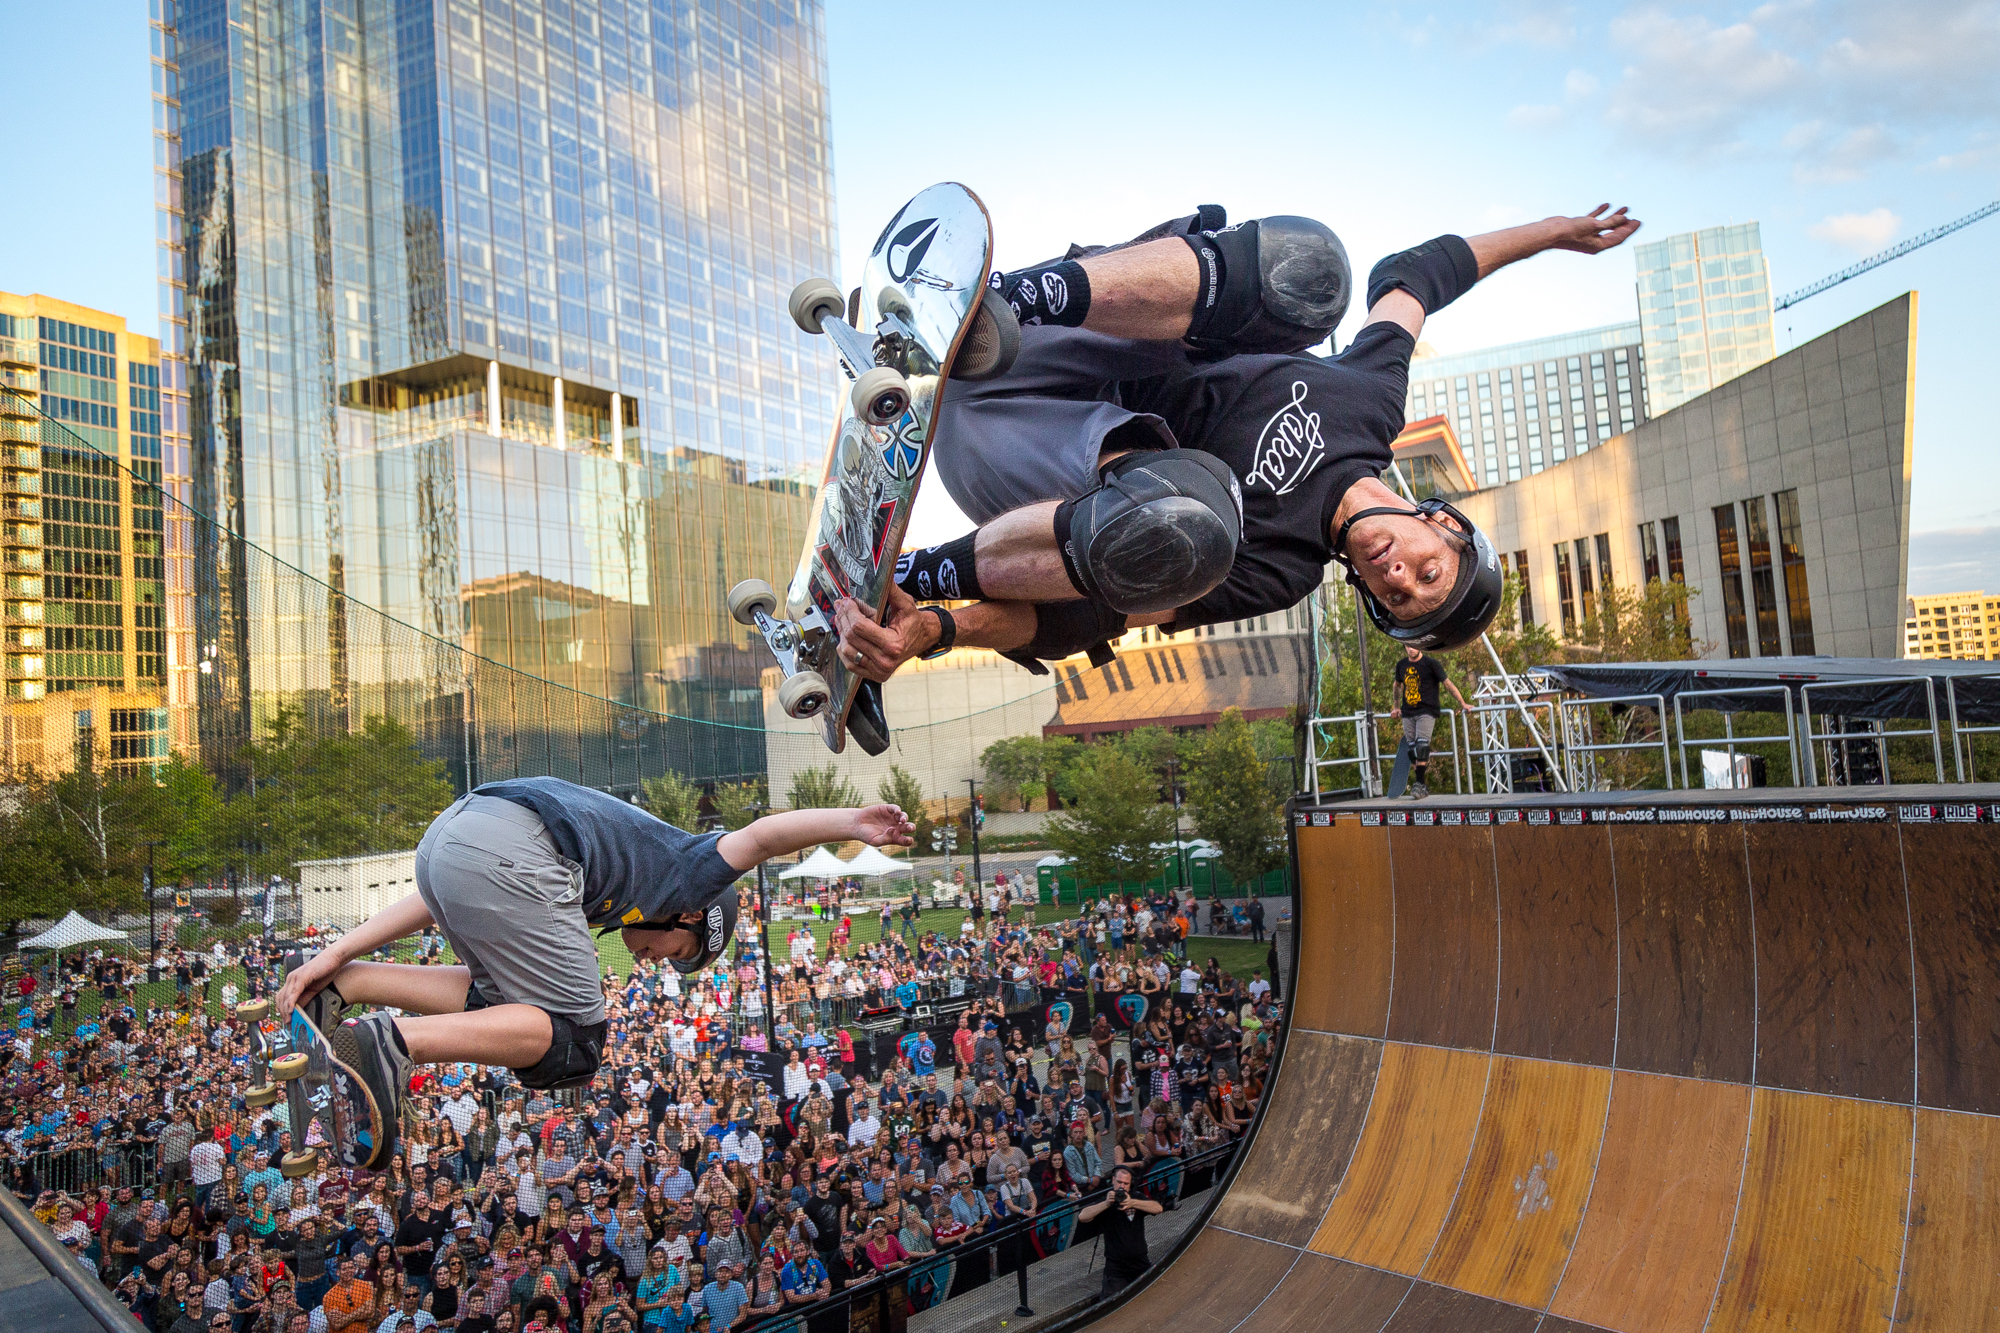 Tony Hawk at Skate Jam